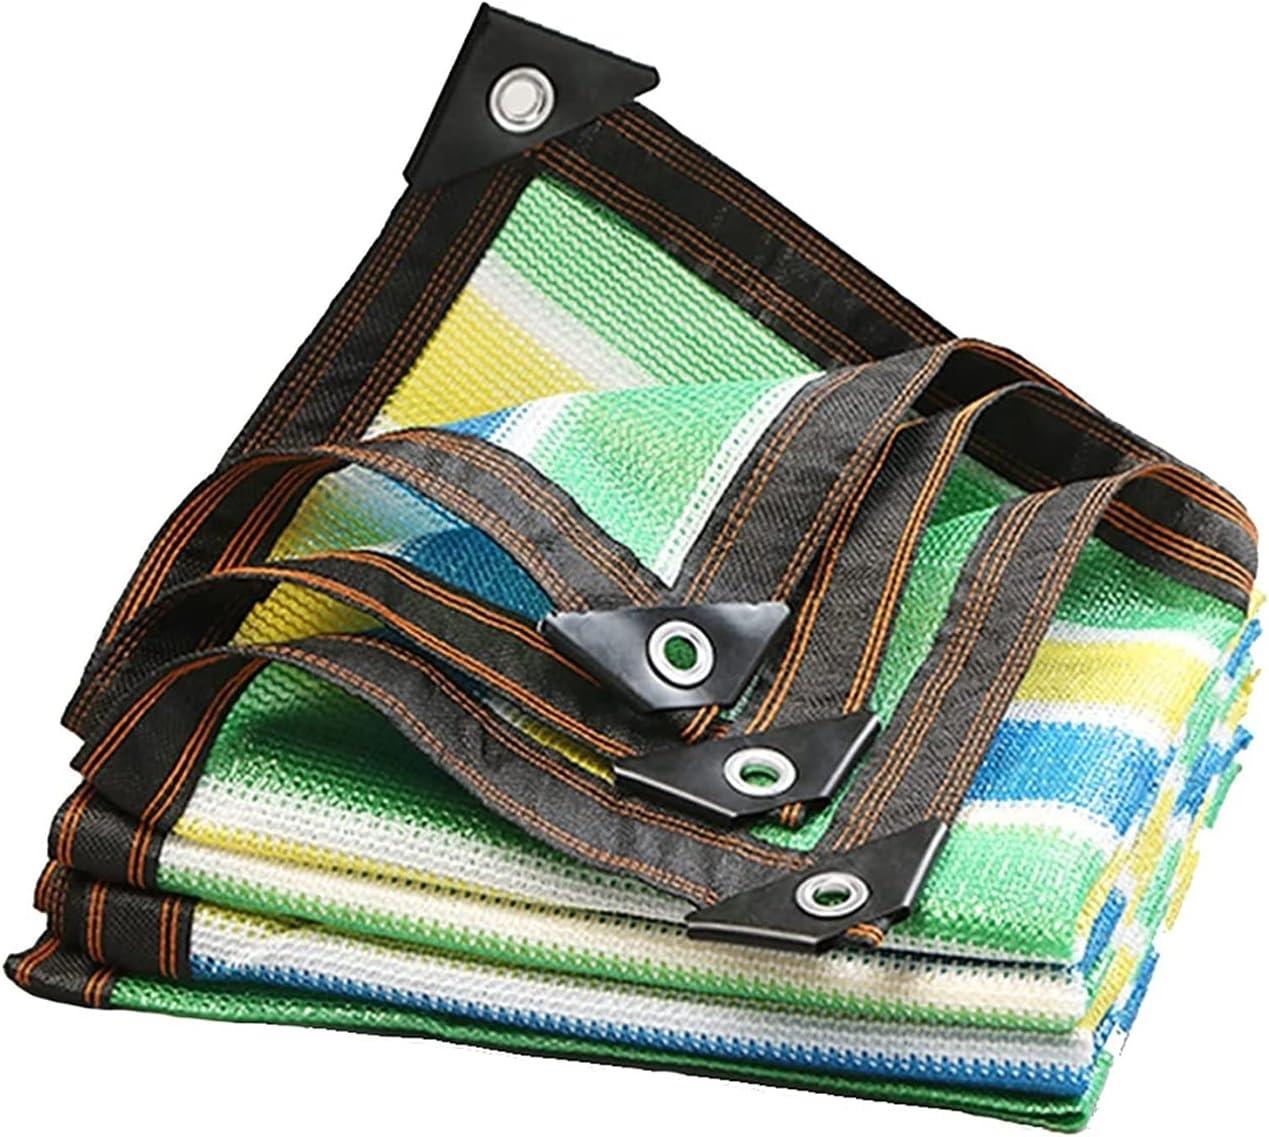 LLCY Ranking TOP18 Shade Cloth Net Mesh Price reduction Tarp 85% Prot UV-Resistant